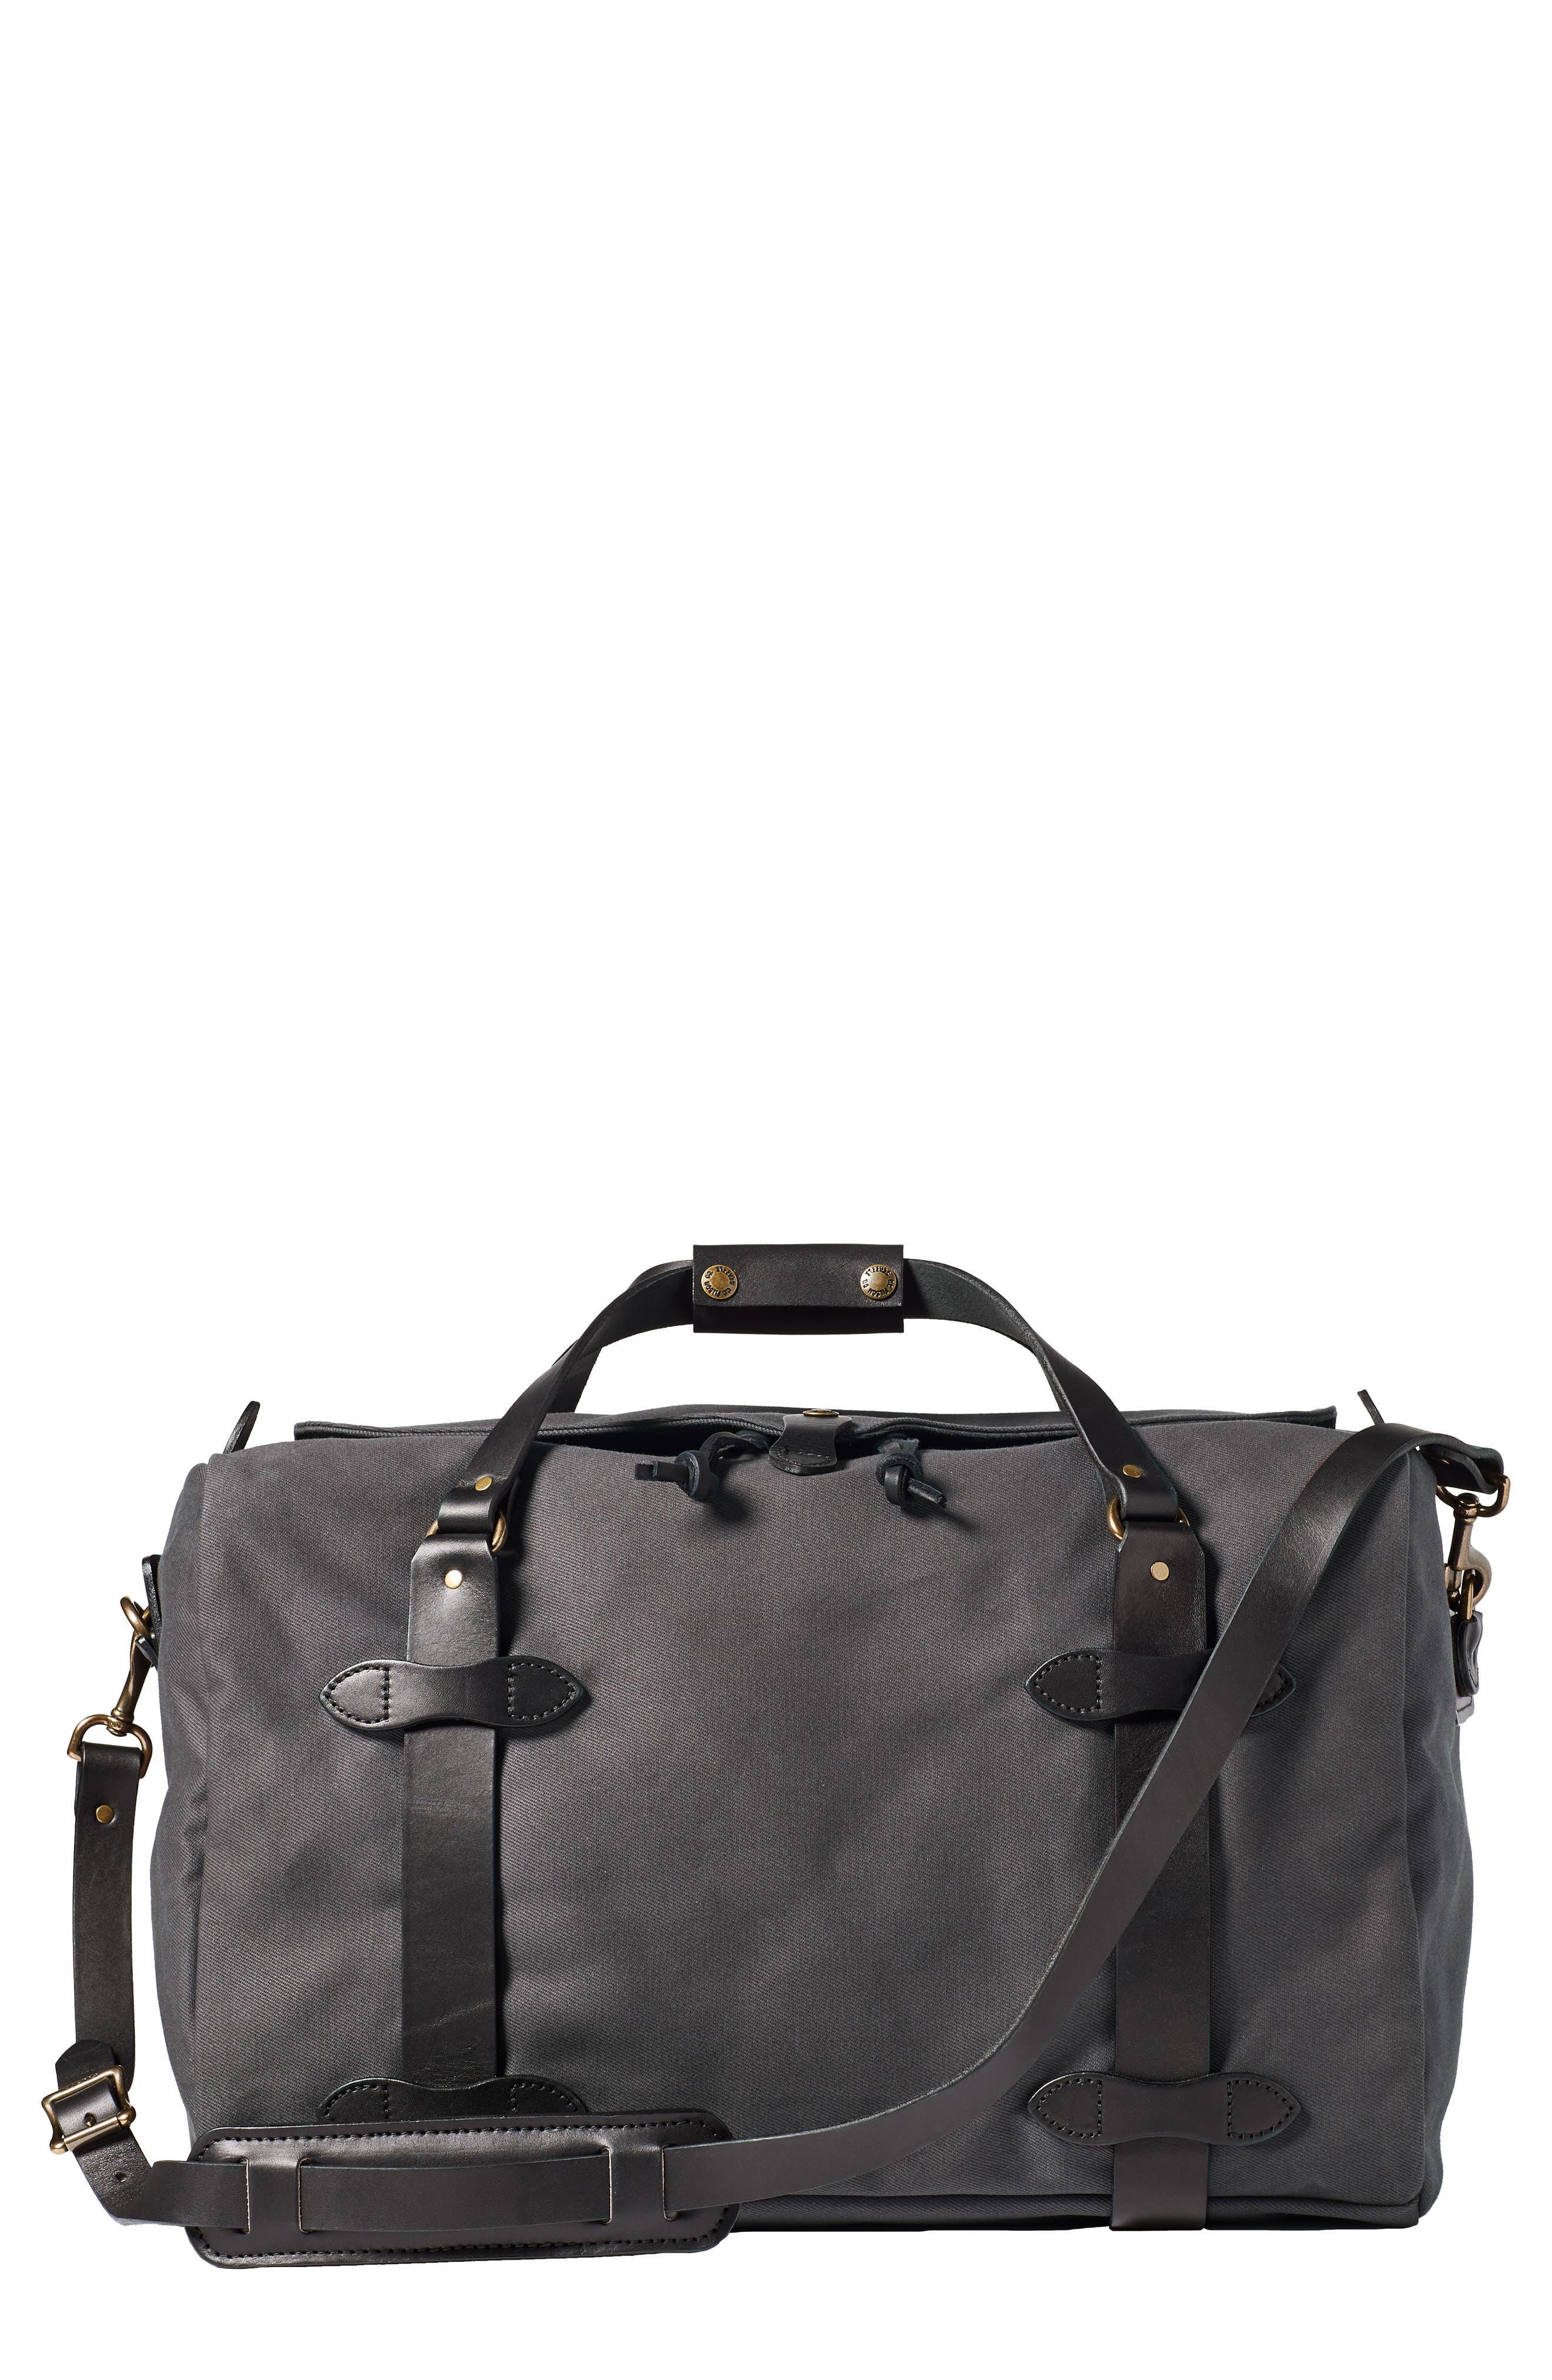 Medium Duffel Bag,                             Main thumbnail 1, color,                             CINDER